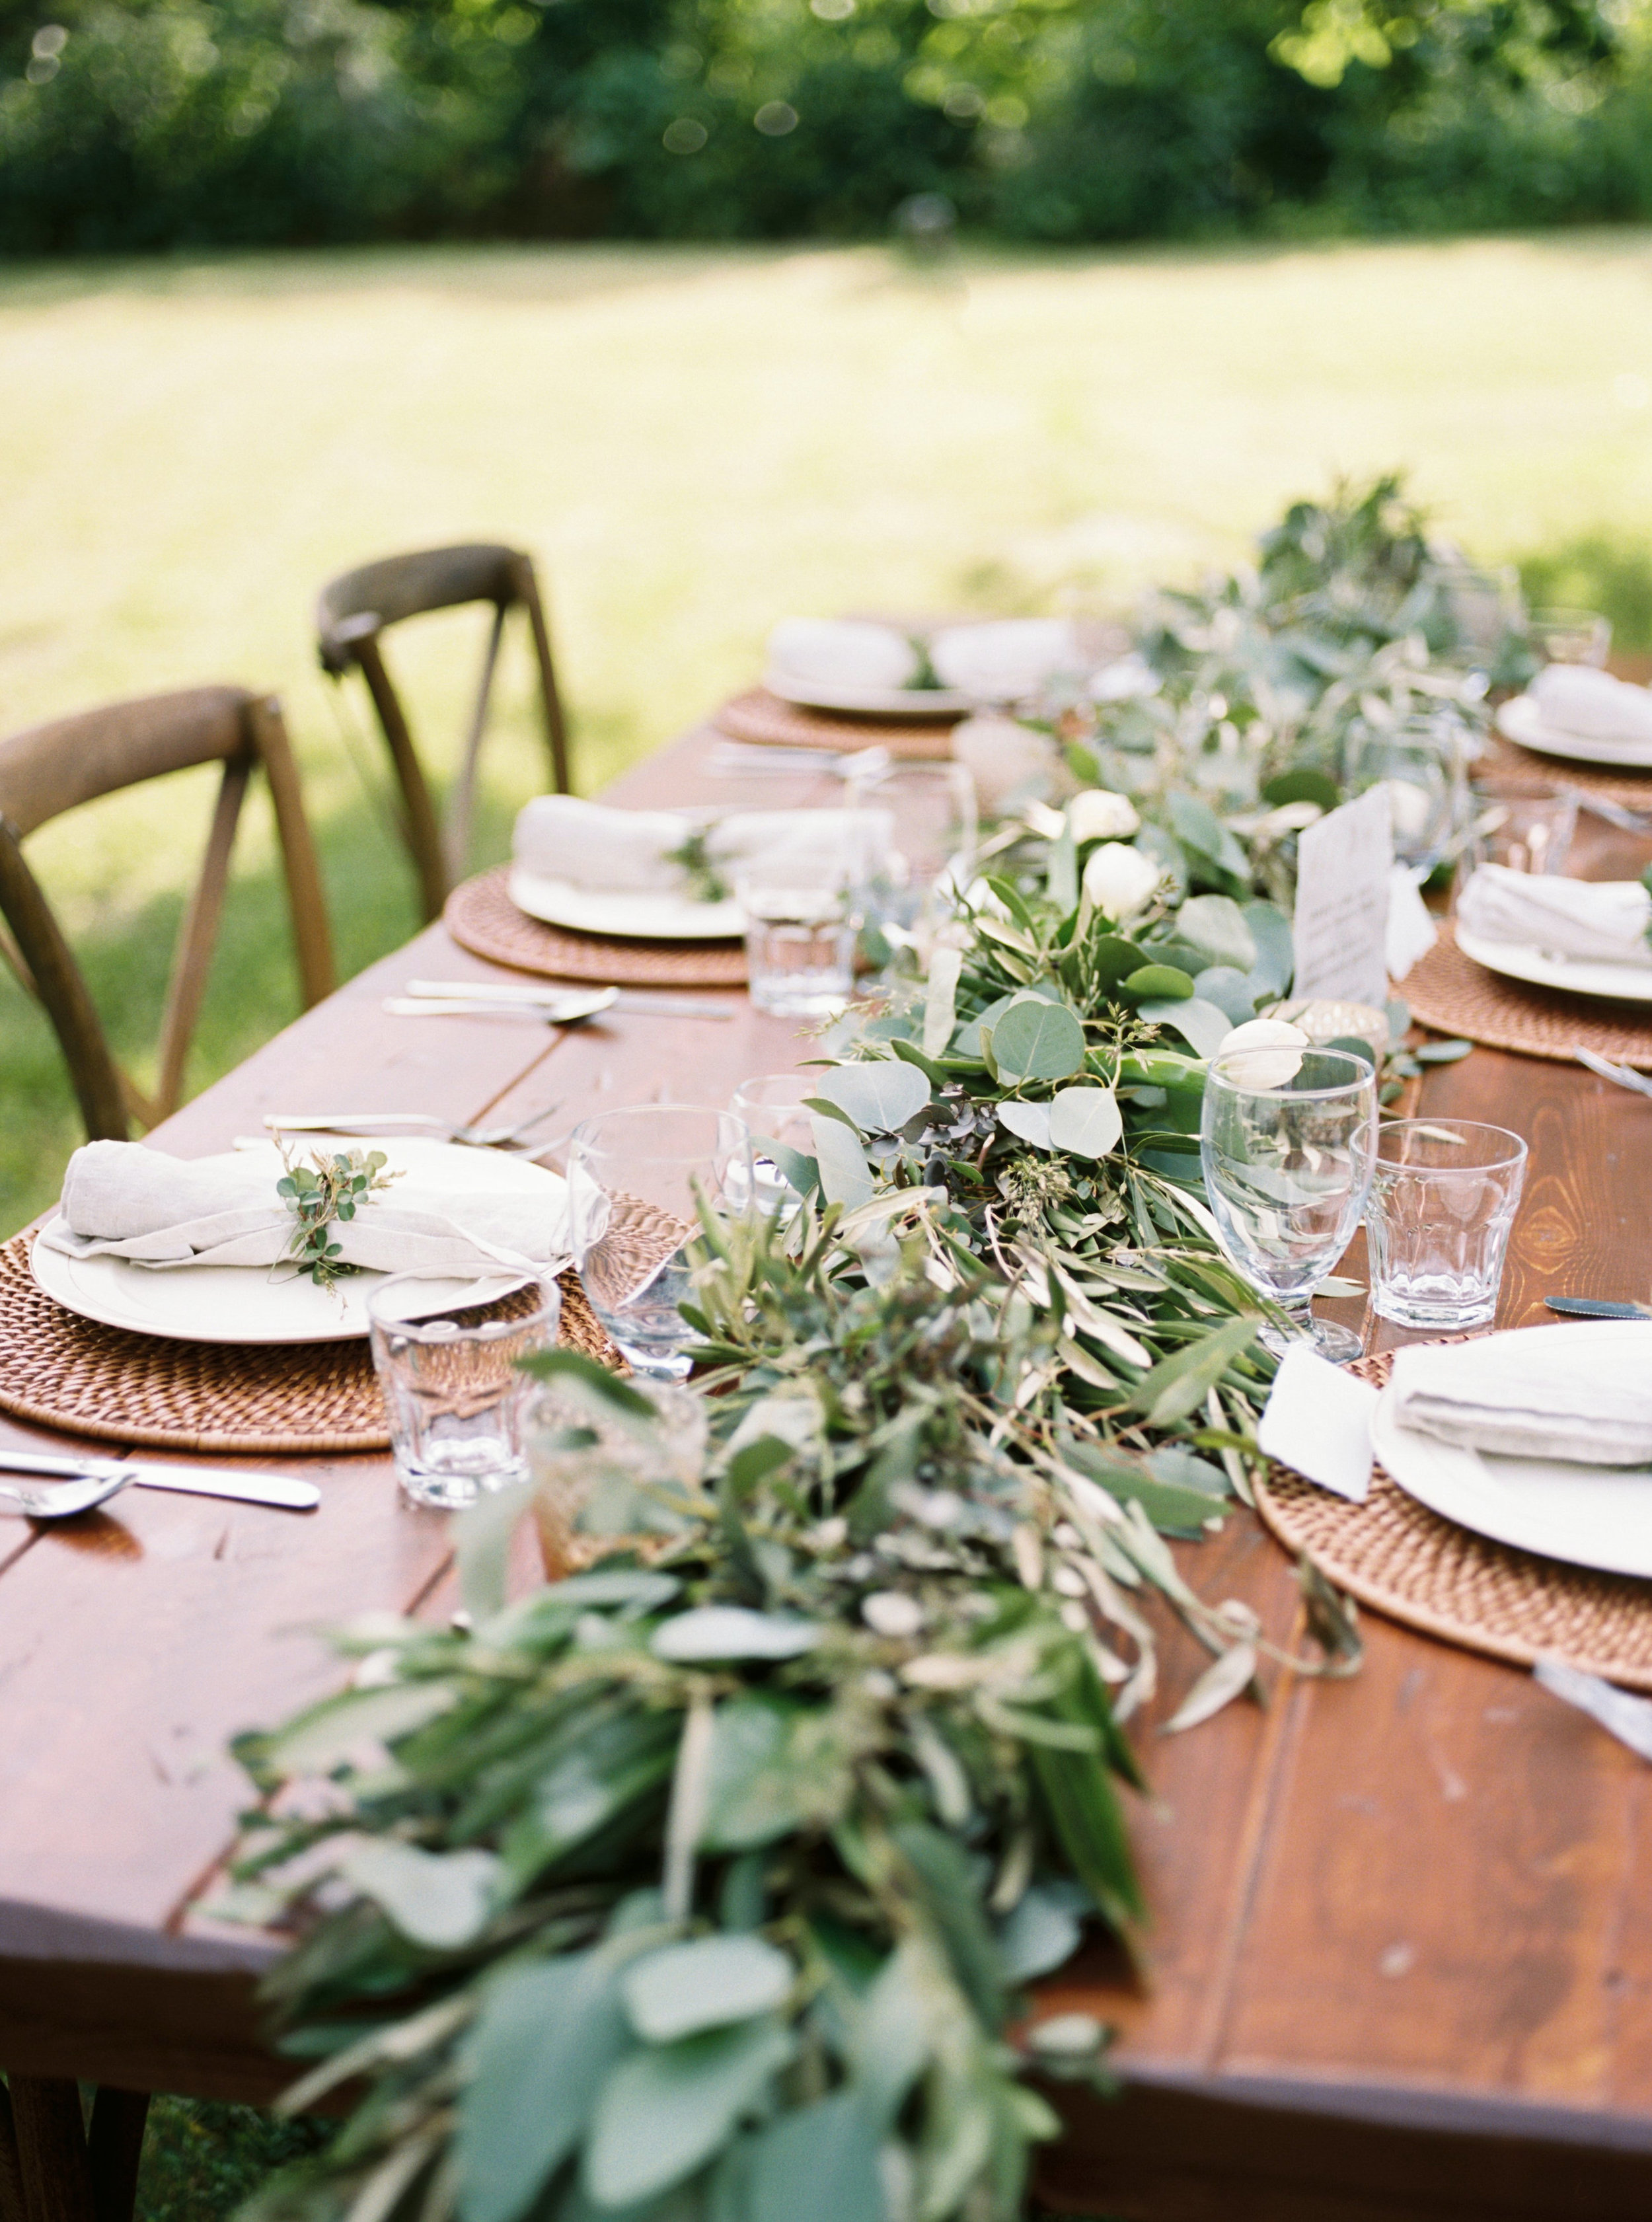 greenhouse-wedding-inspiration-by-laurelyn-savannah-photography-19.jpg